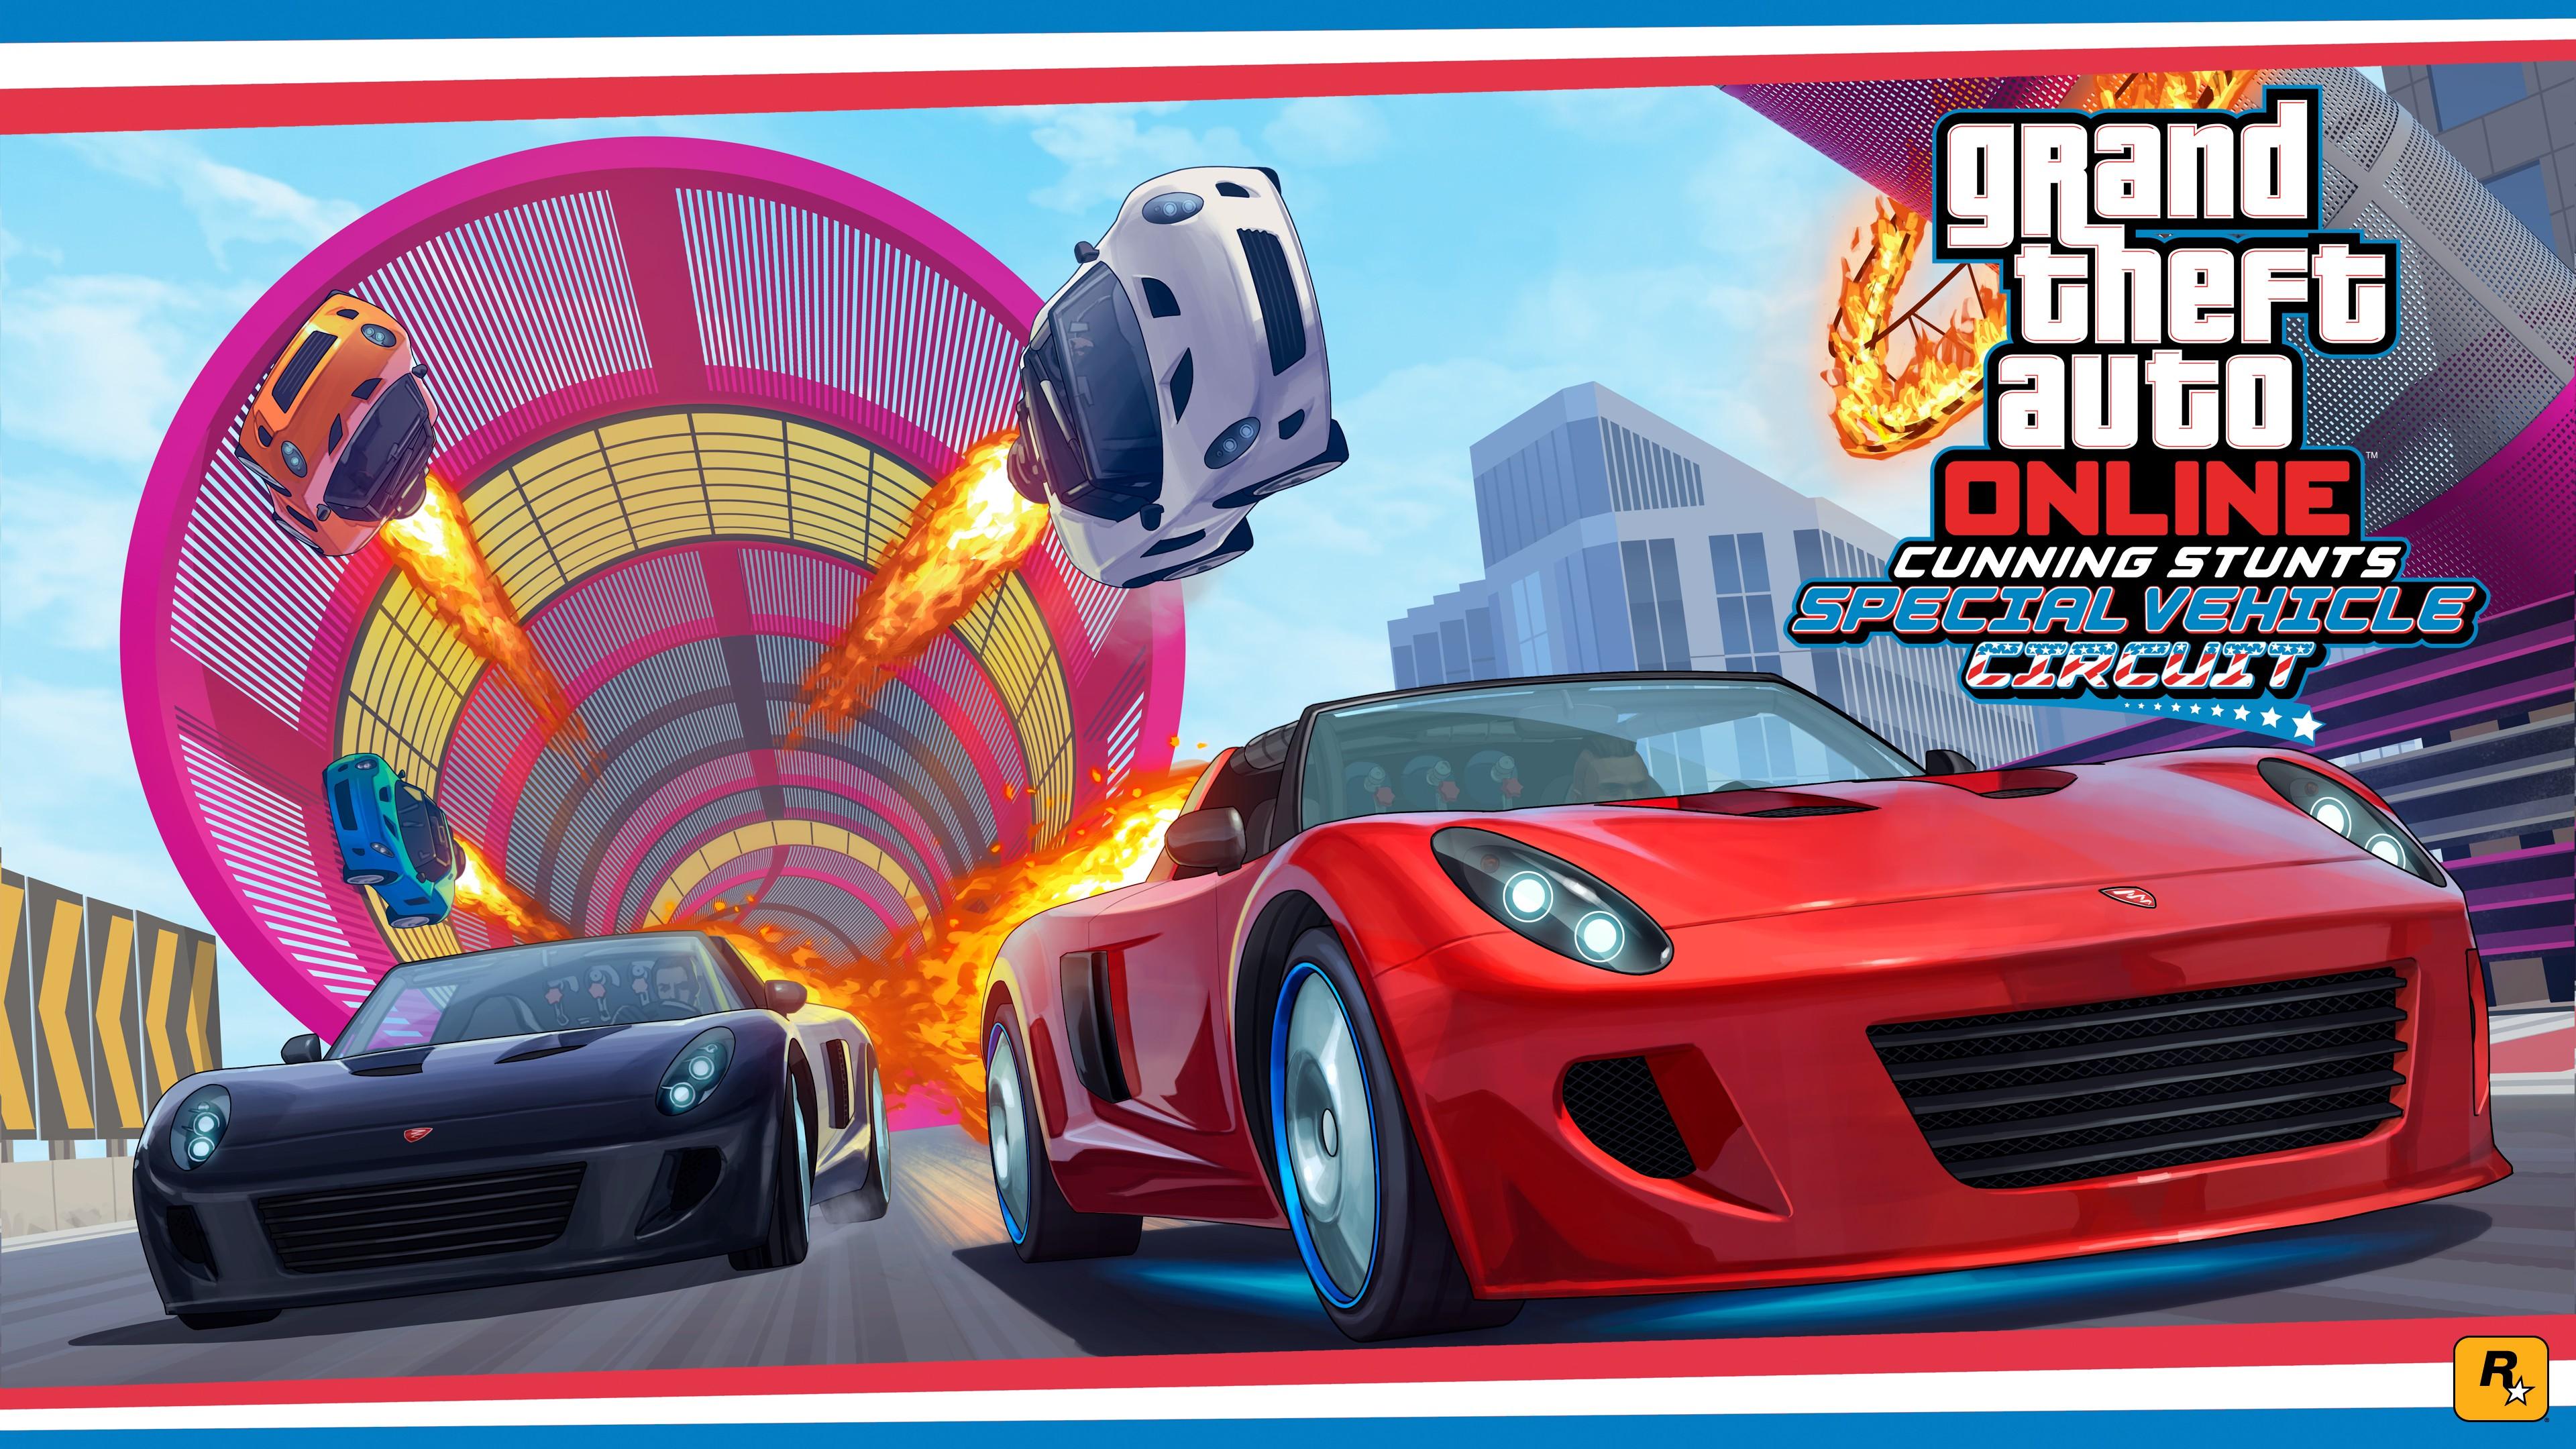 Wallpaper : Grand Theft Auto V, Grand Theft Auto Online